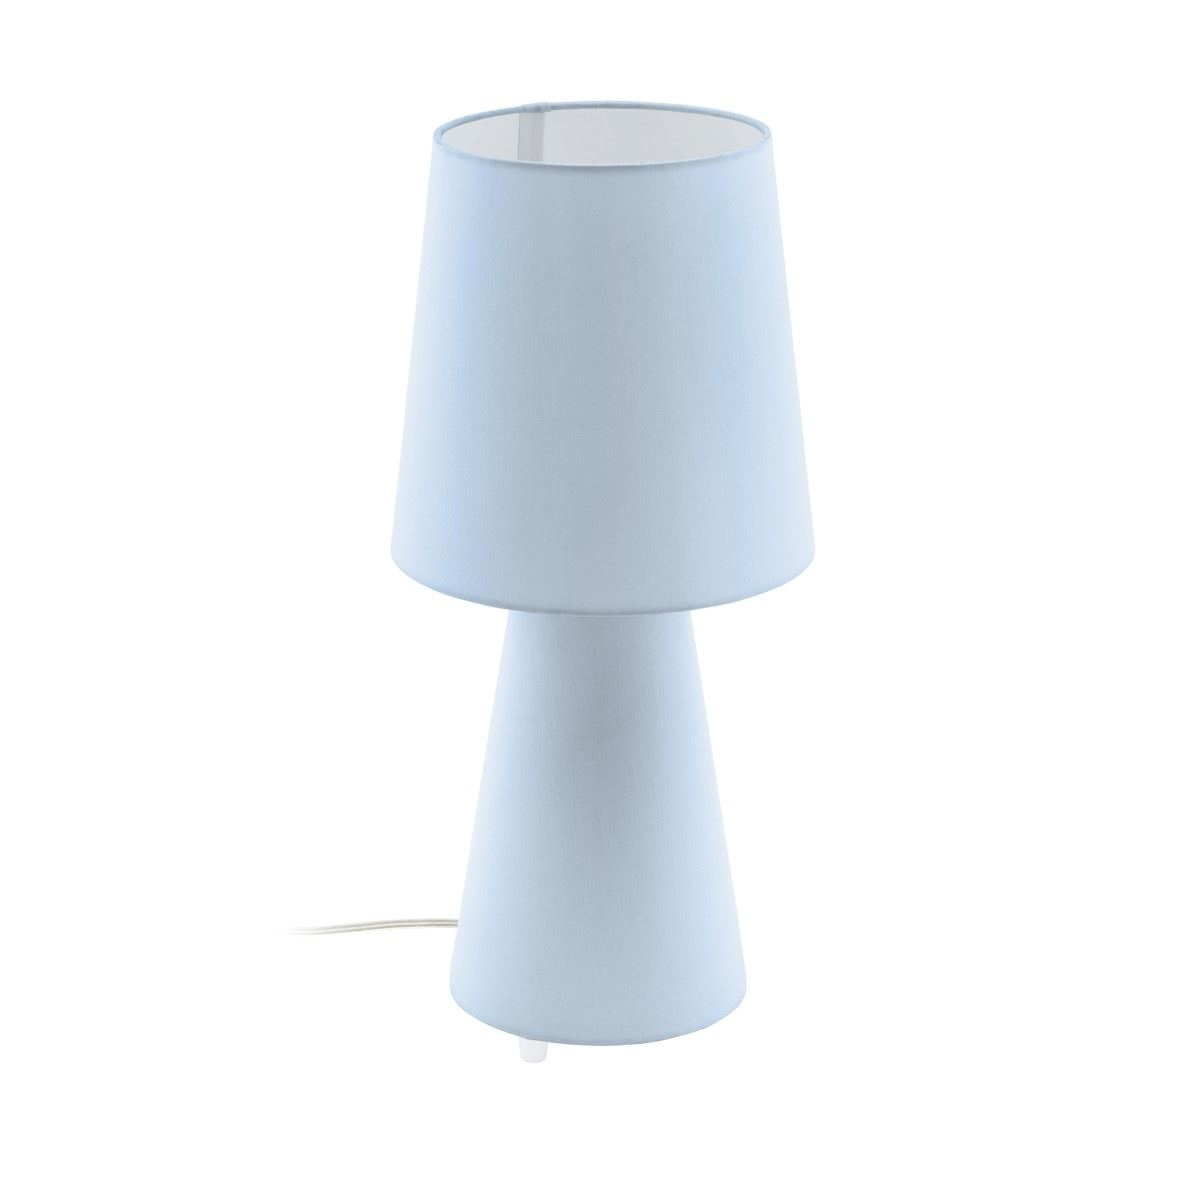 Carpara Fabric Table Lamp New Style & Fabric Lamp Shade